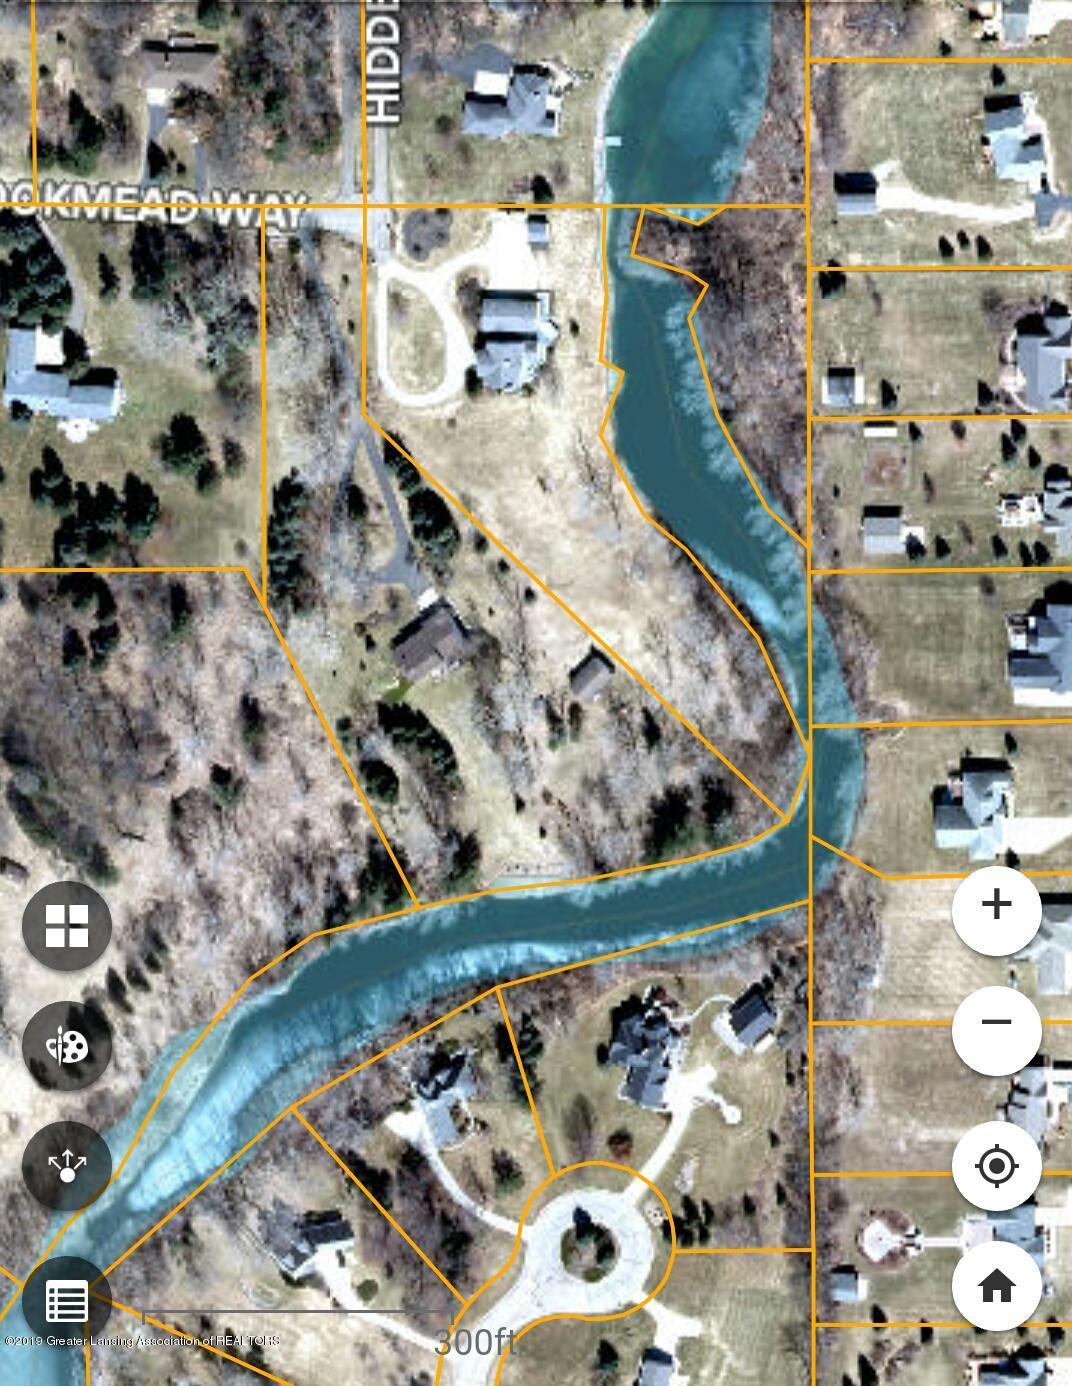 2362 Brookmead Way - 2019-02-07_15.40.49 - 67